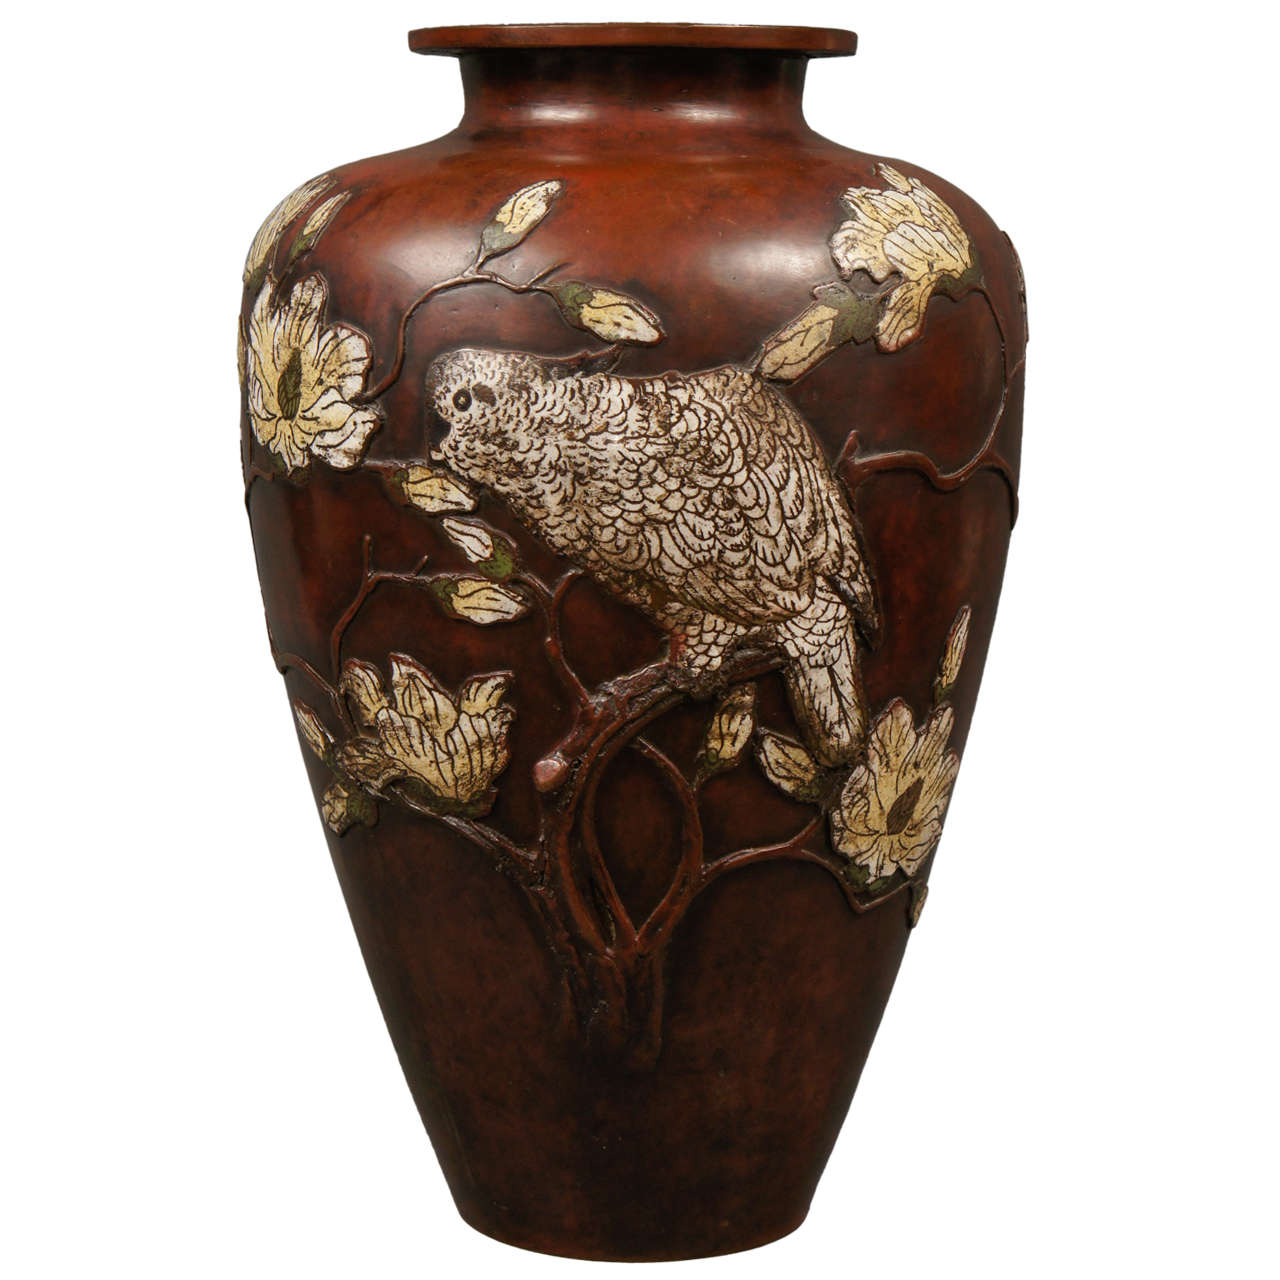 Very Large 19th Century Japanese Cloisonné Bronze Vase with Magnolias